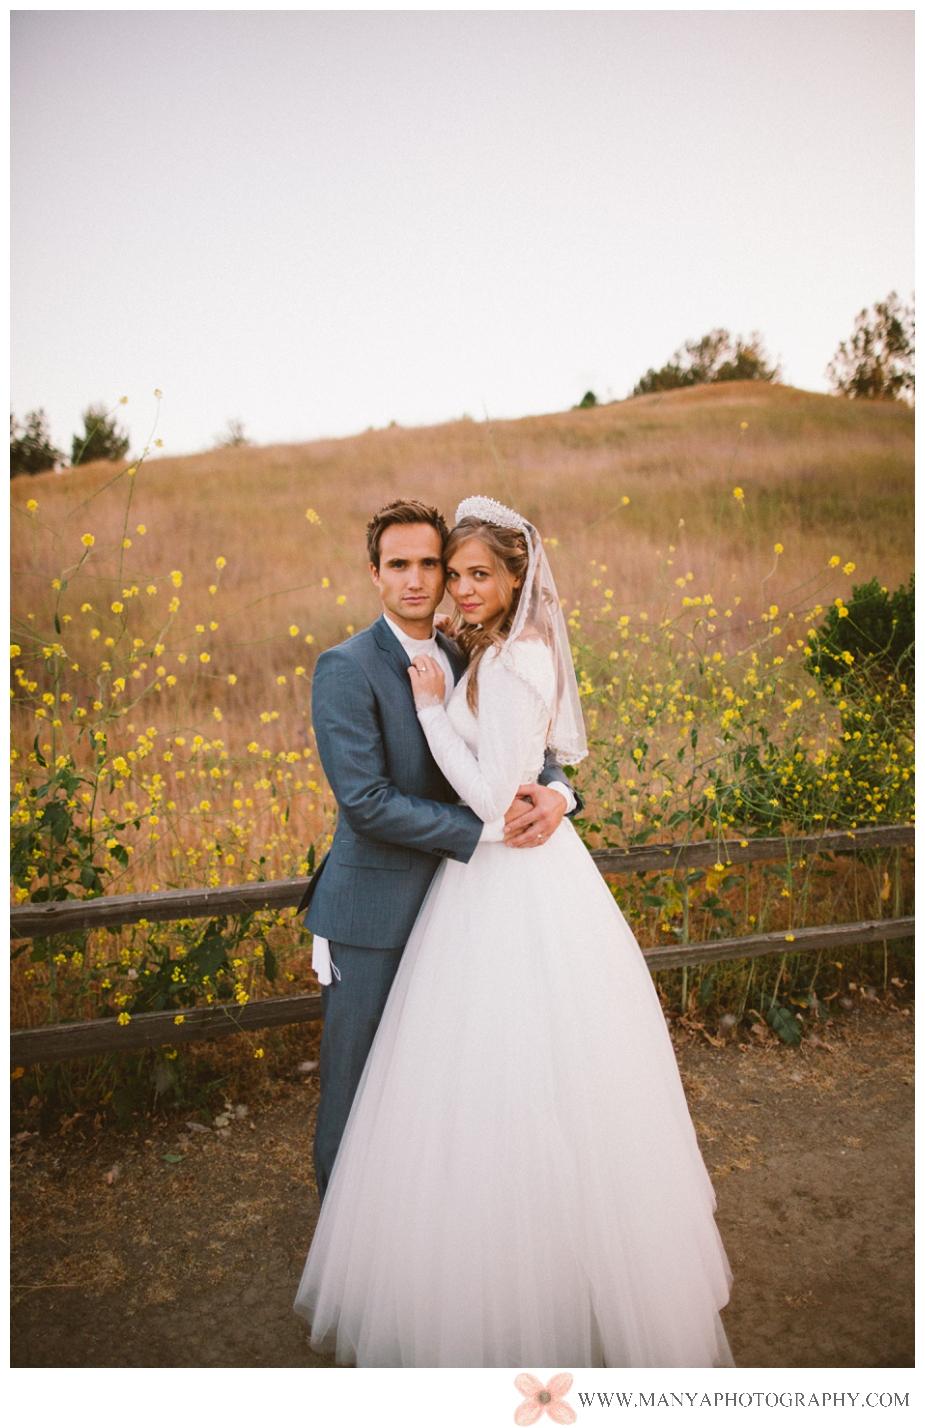 2013-07-23_0025 - Orange County Wedding Photography